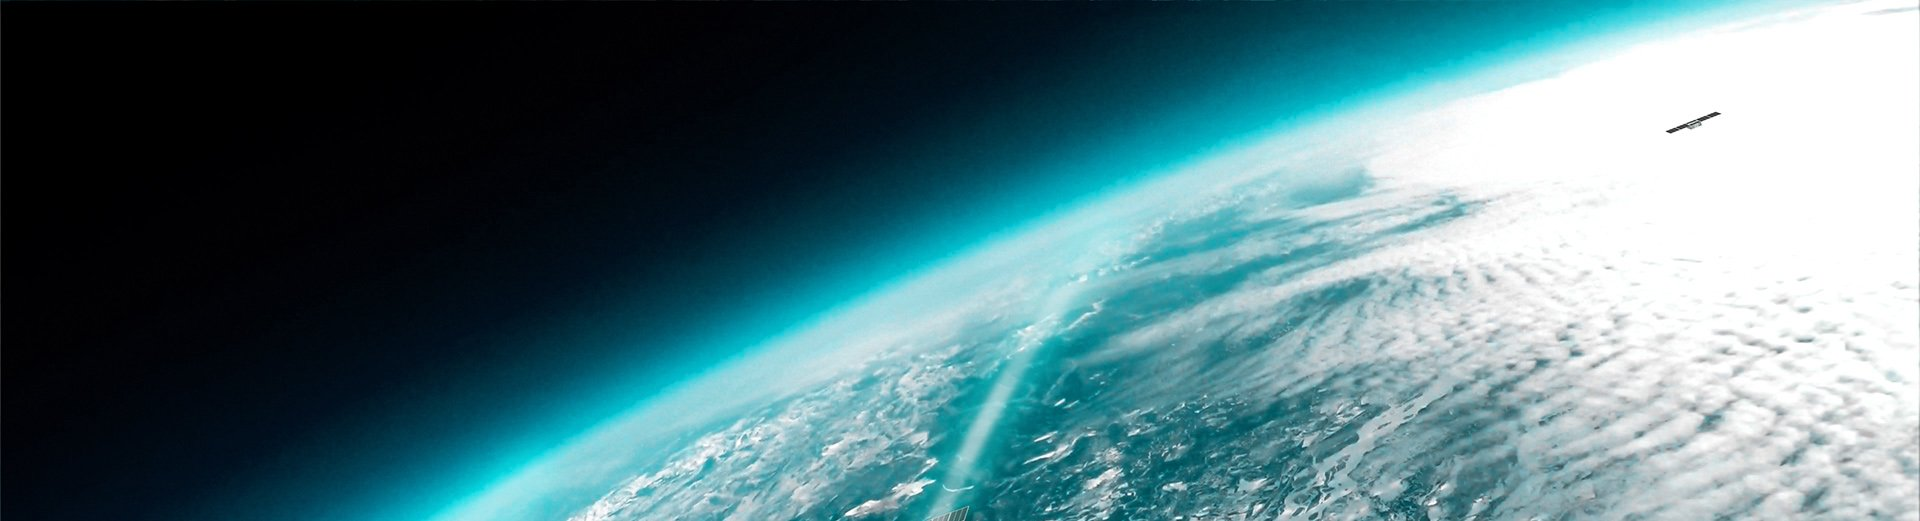 Xona Space Systems raises $1 million to improve satellite-based navigation services thumbnail